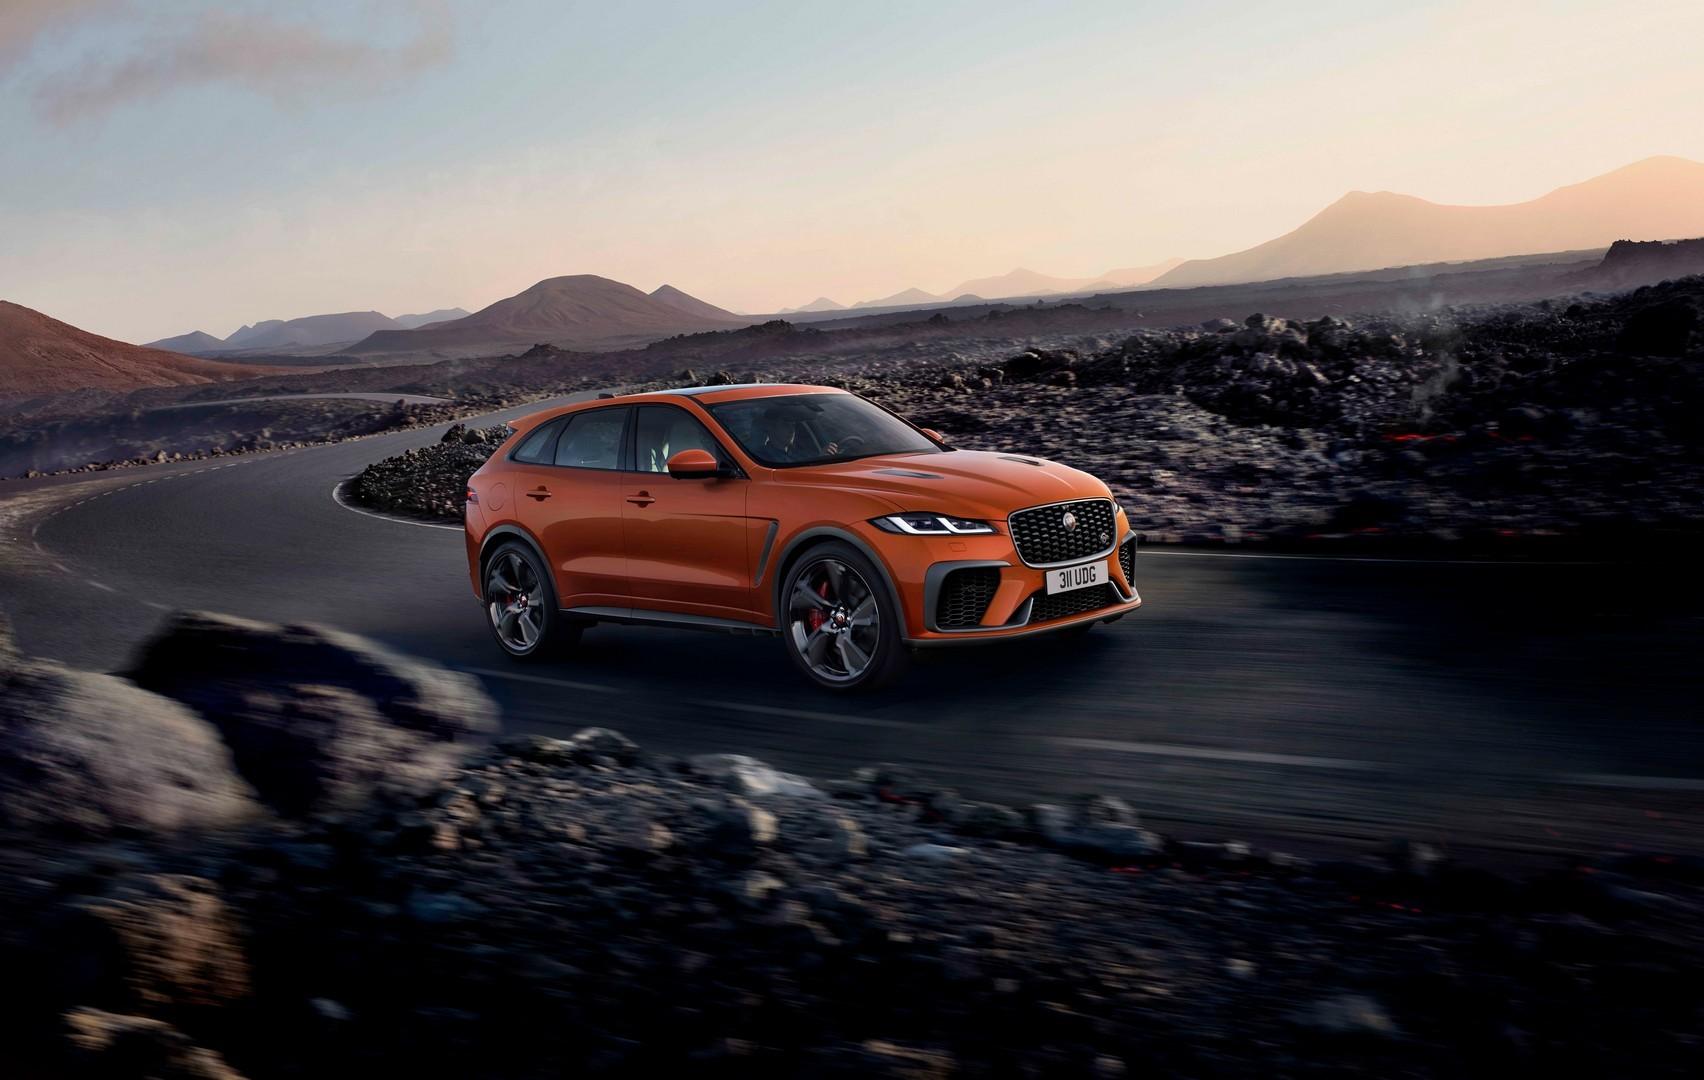 jaguar introduces dynamic launch to 2021 f-pace svr, goes